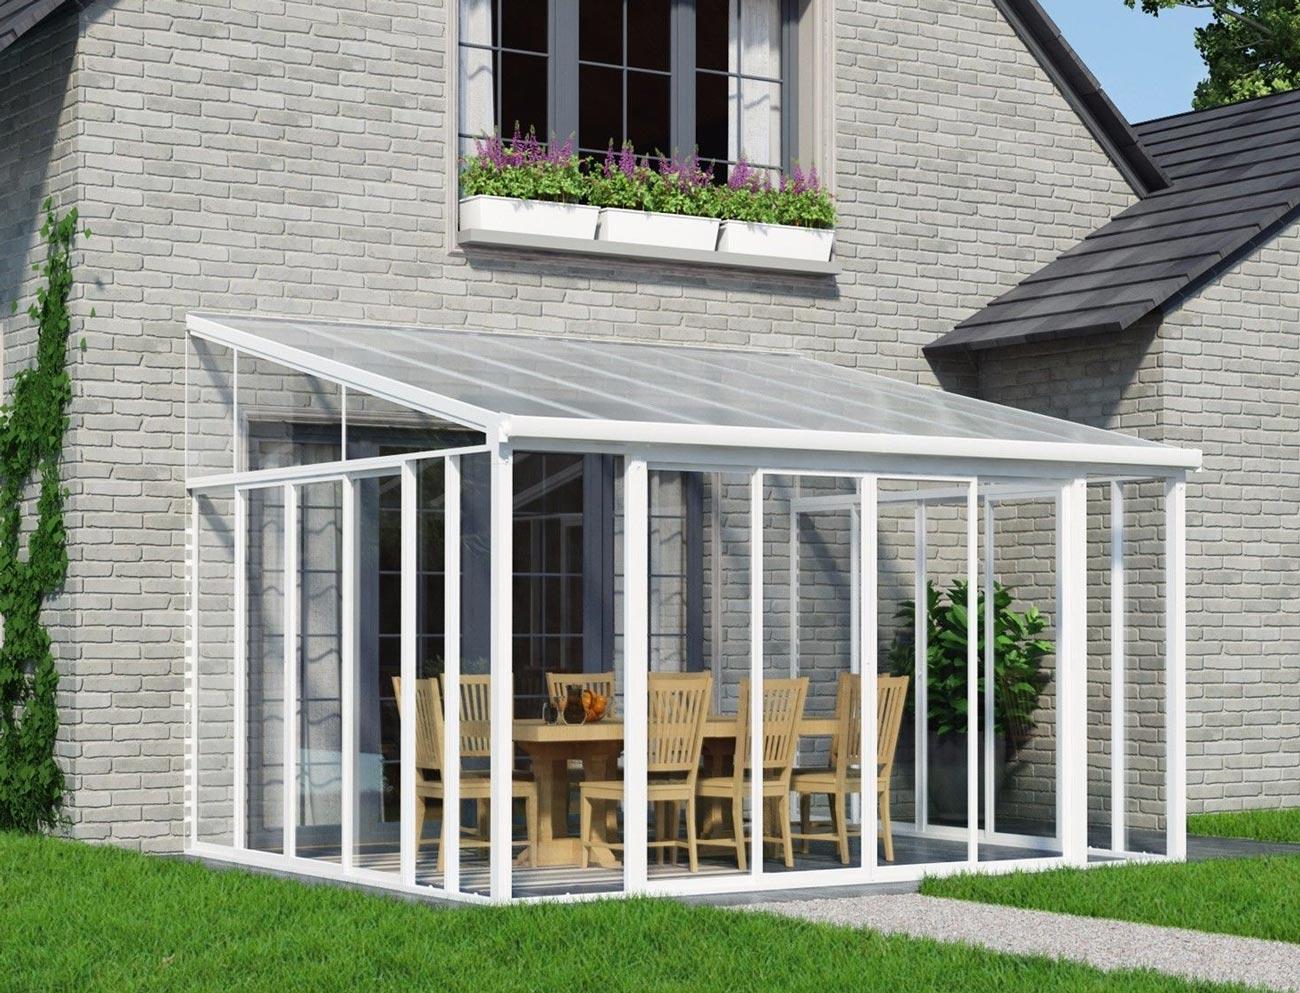 Sanremo 4m sunroom 8749 sydney garden products for Sunroom extensions sydney